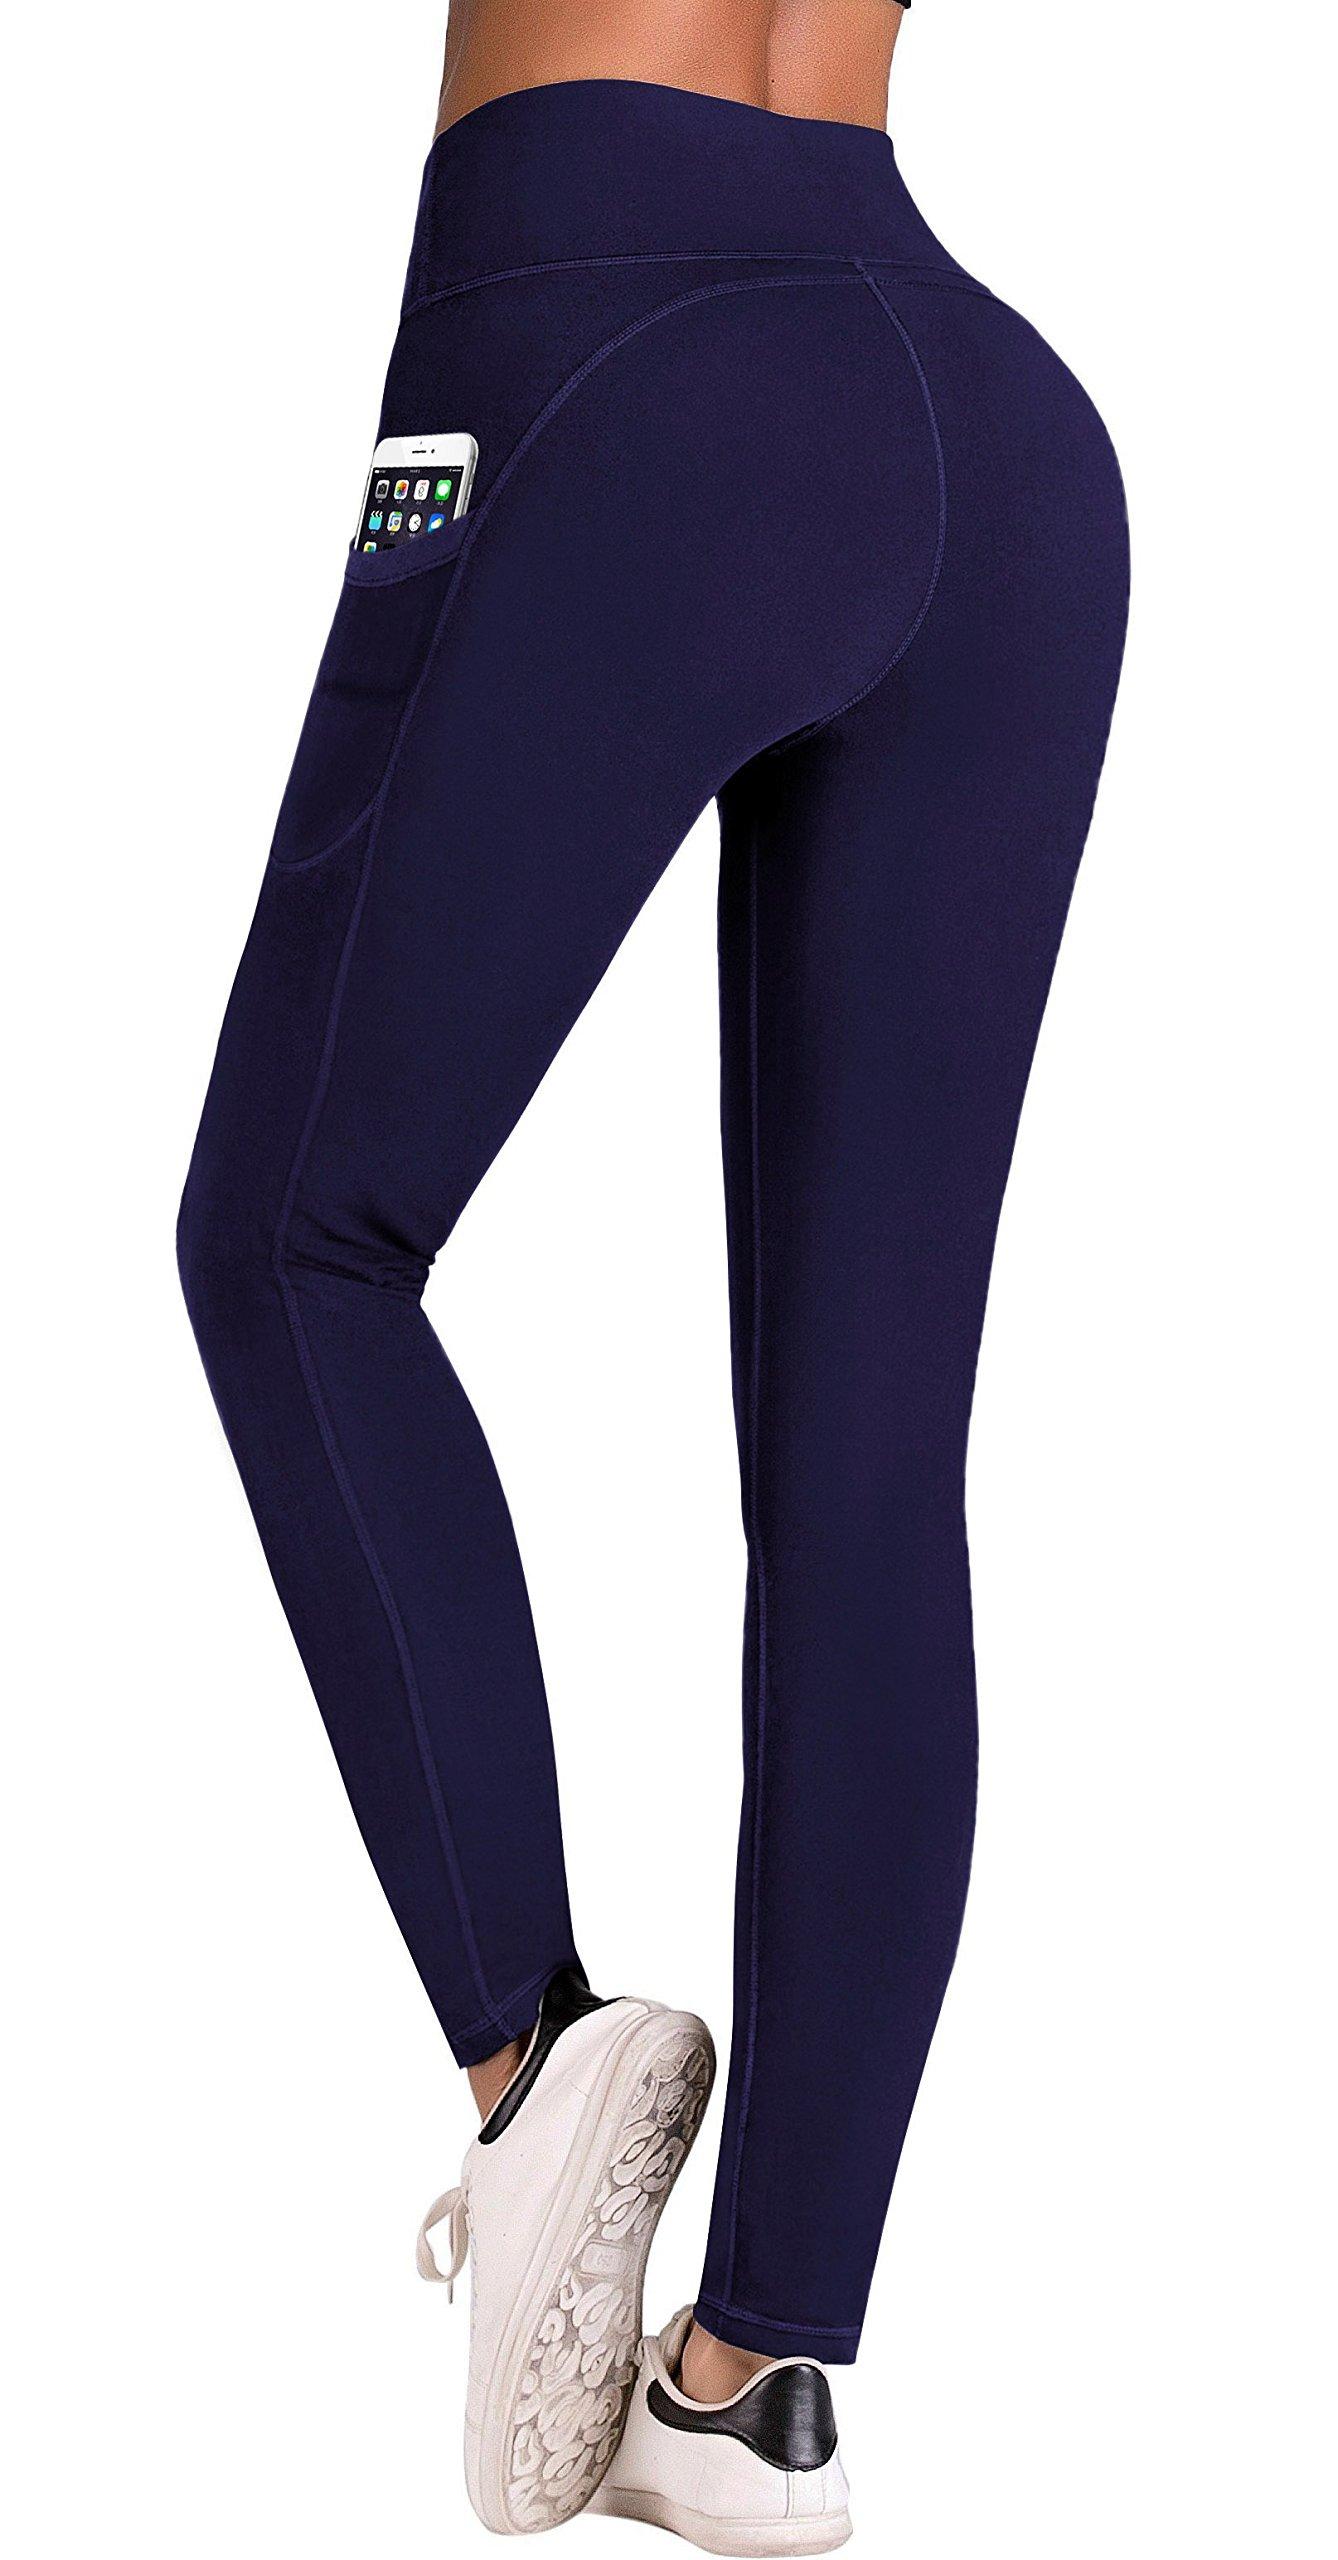 IUGA Pants US 7840 BAOL XS